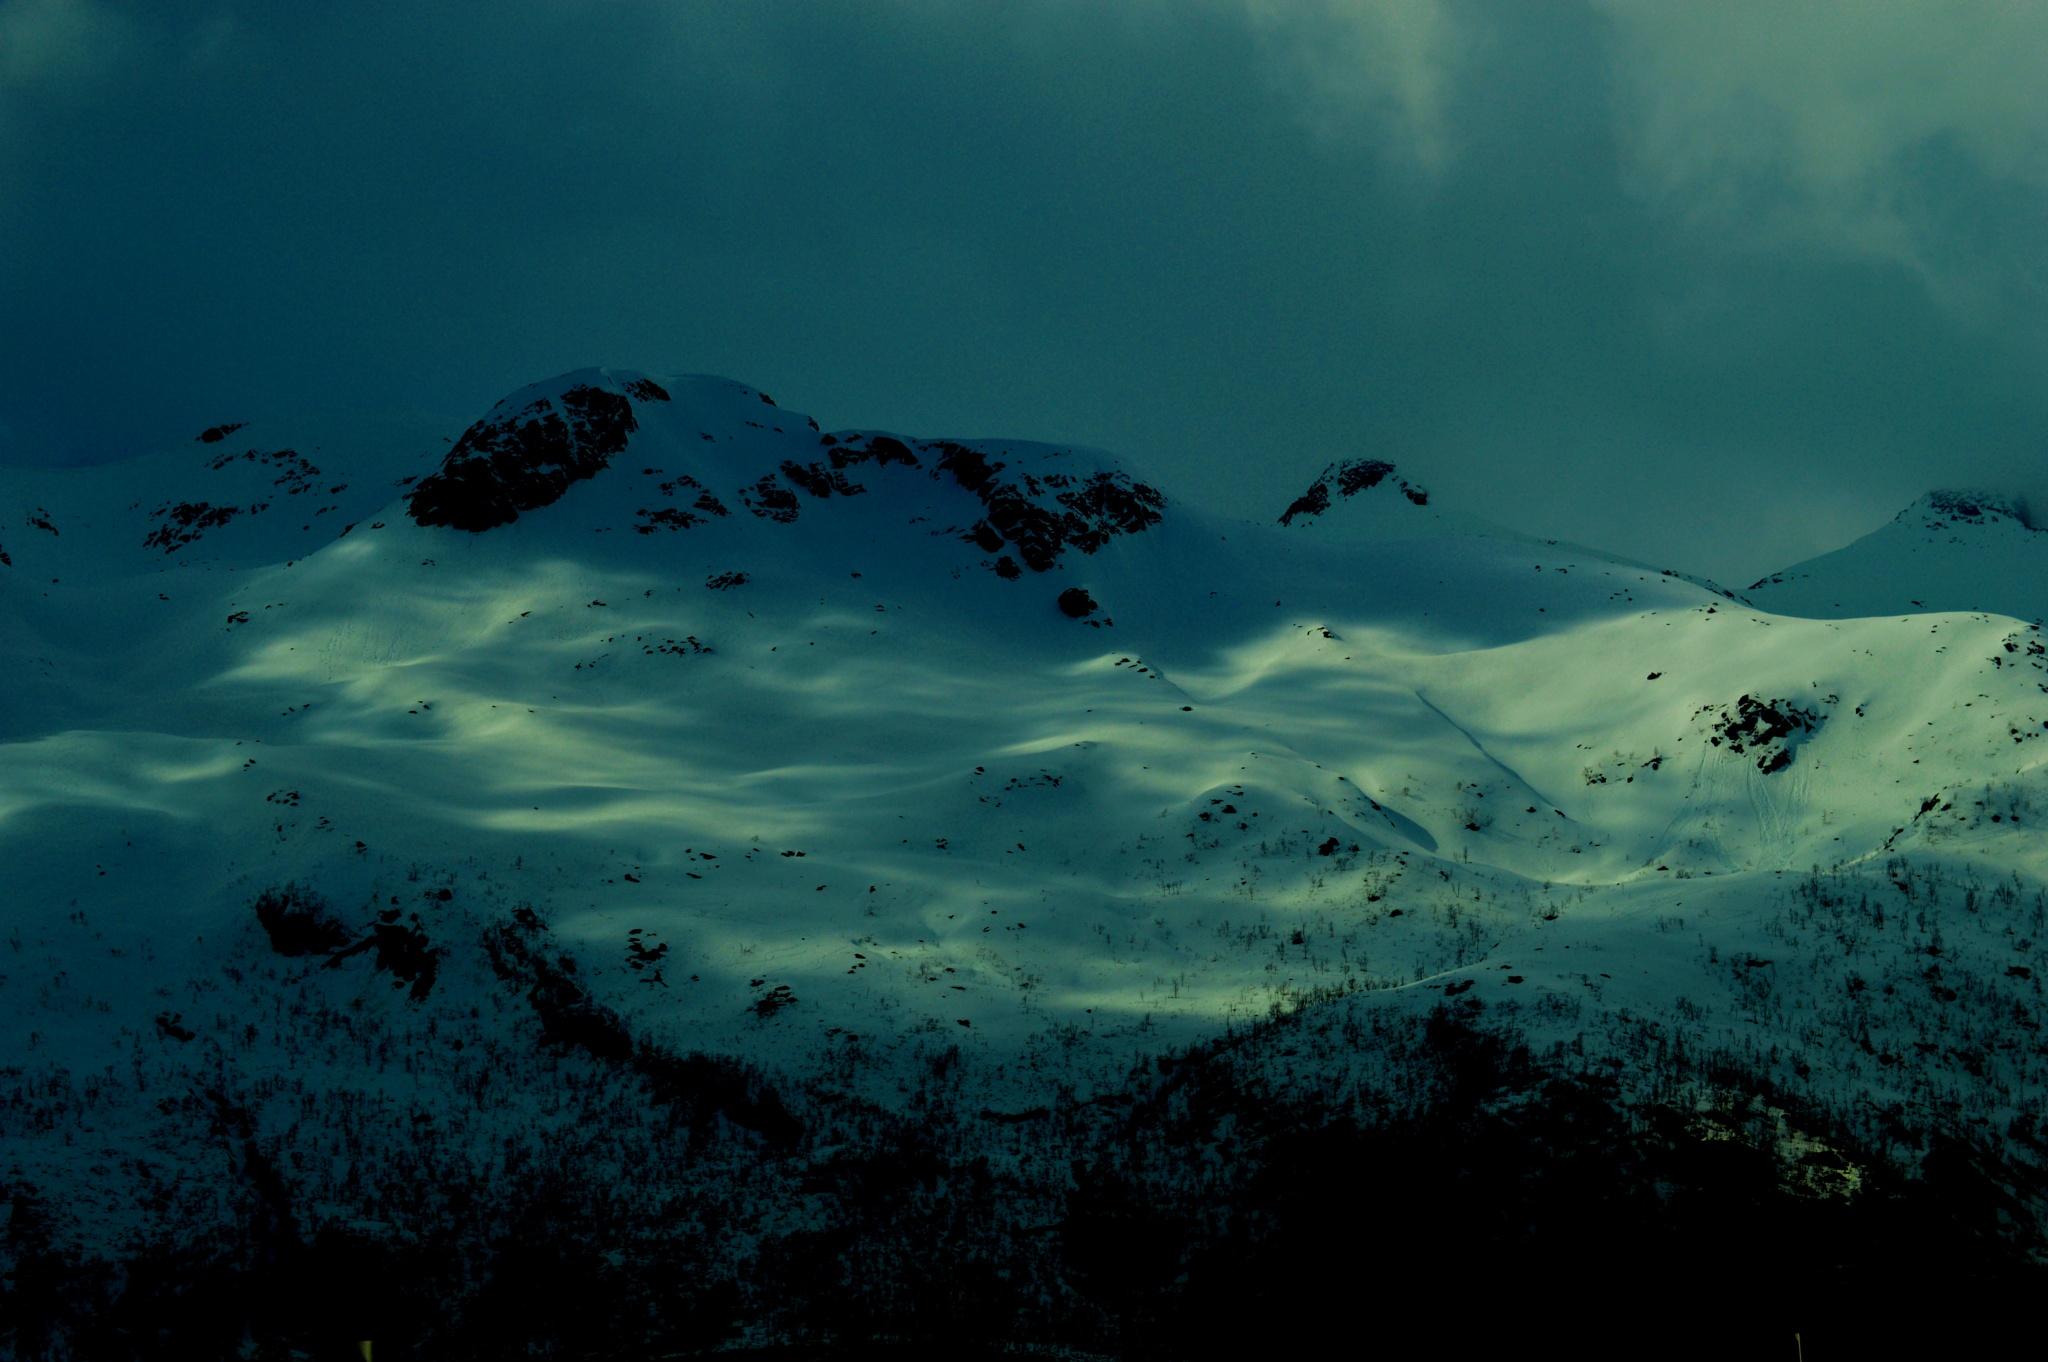 Lofots in Norway by Tea-mari Brax